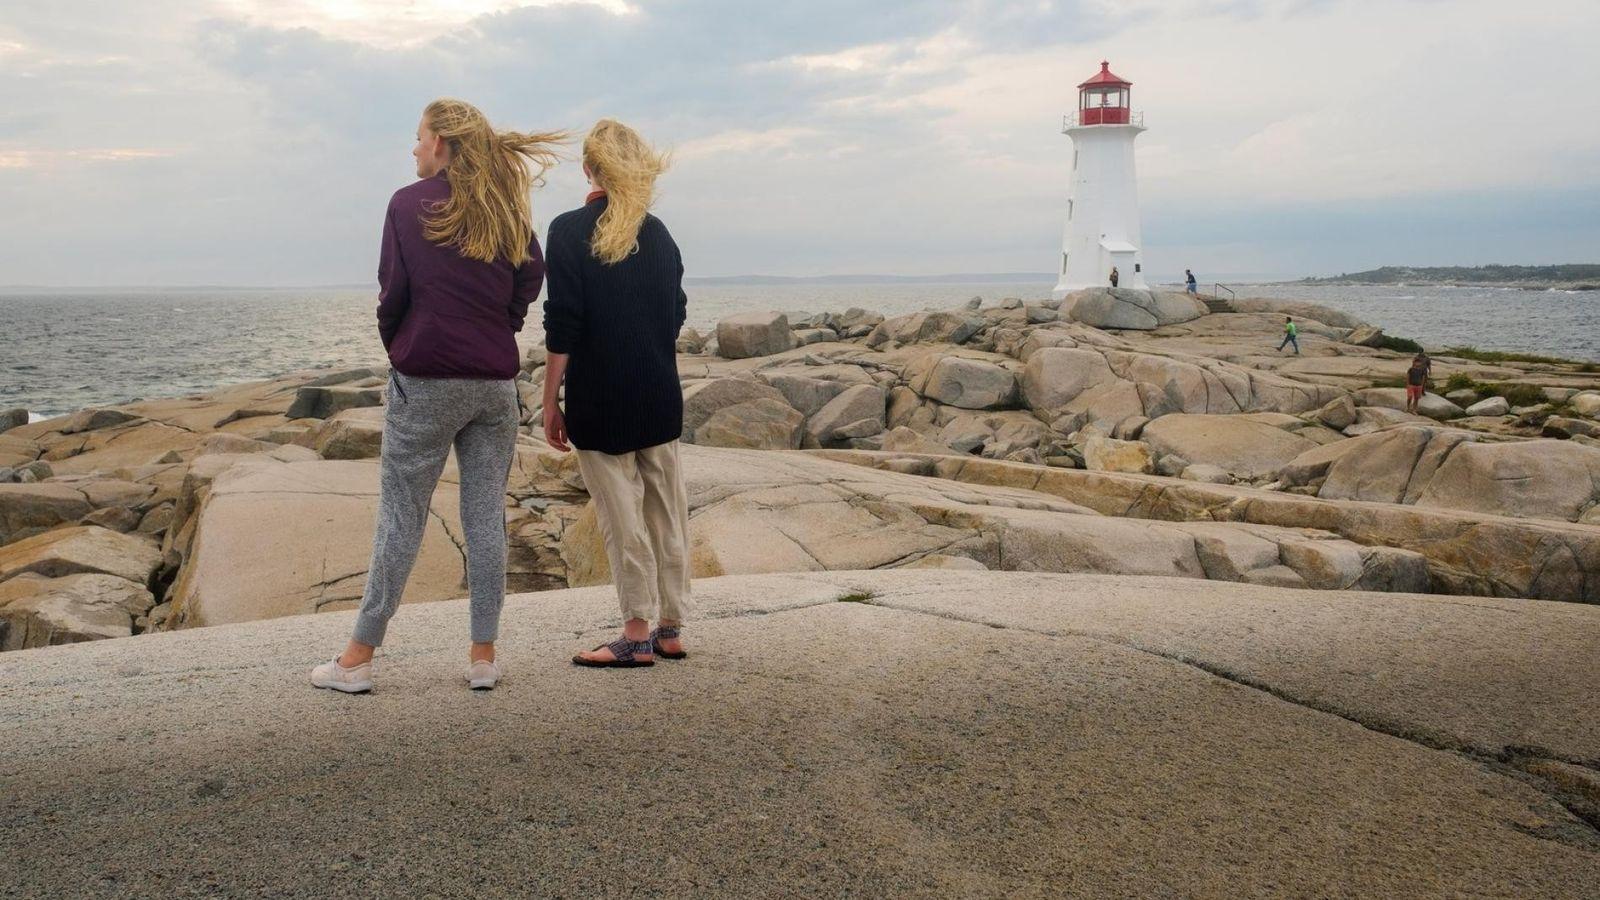 Roadtrip durch Nova Scotia: Leuchttürme und Leckereien